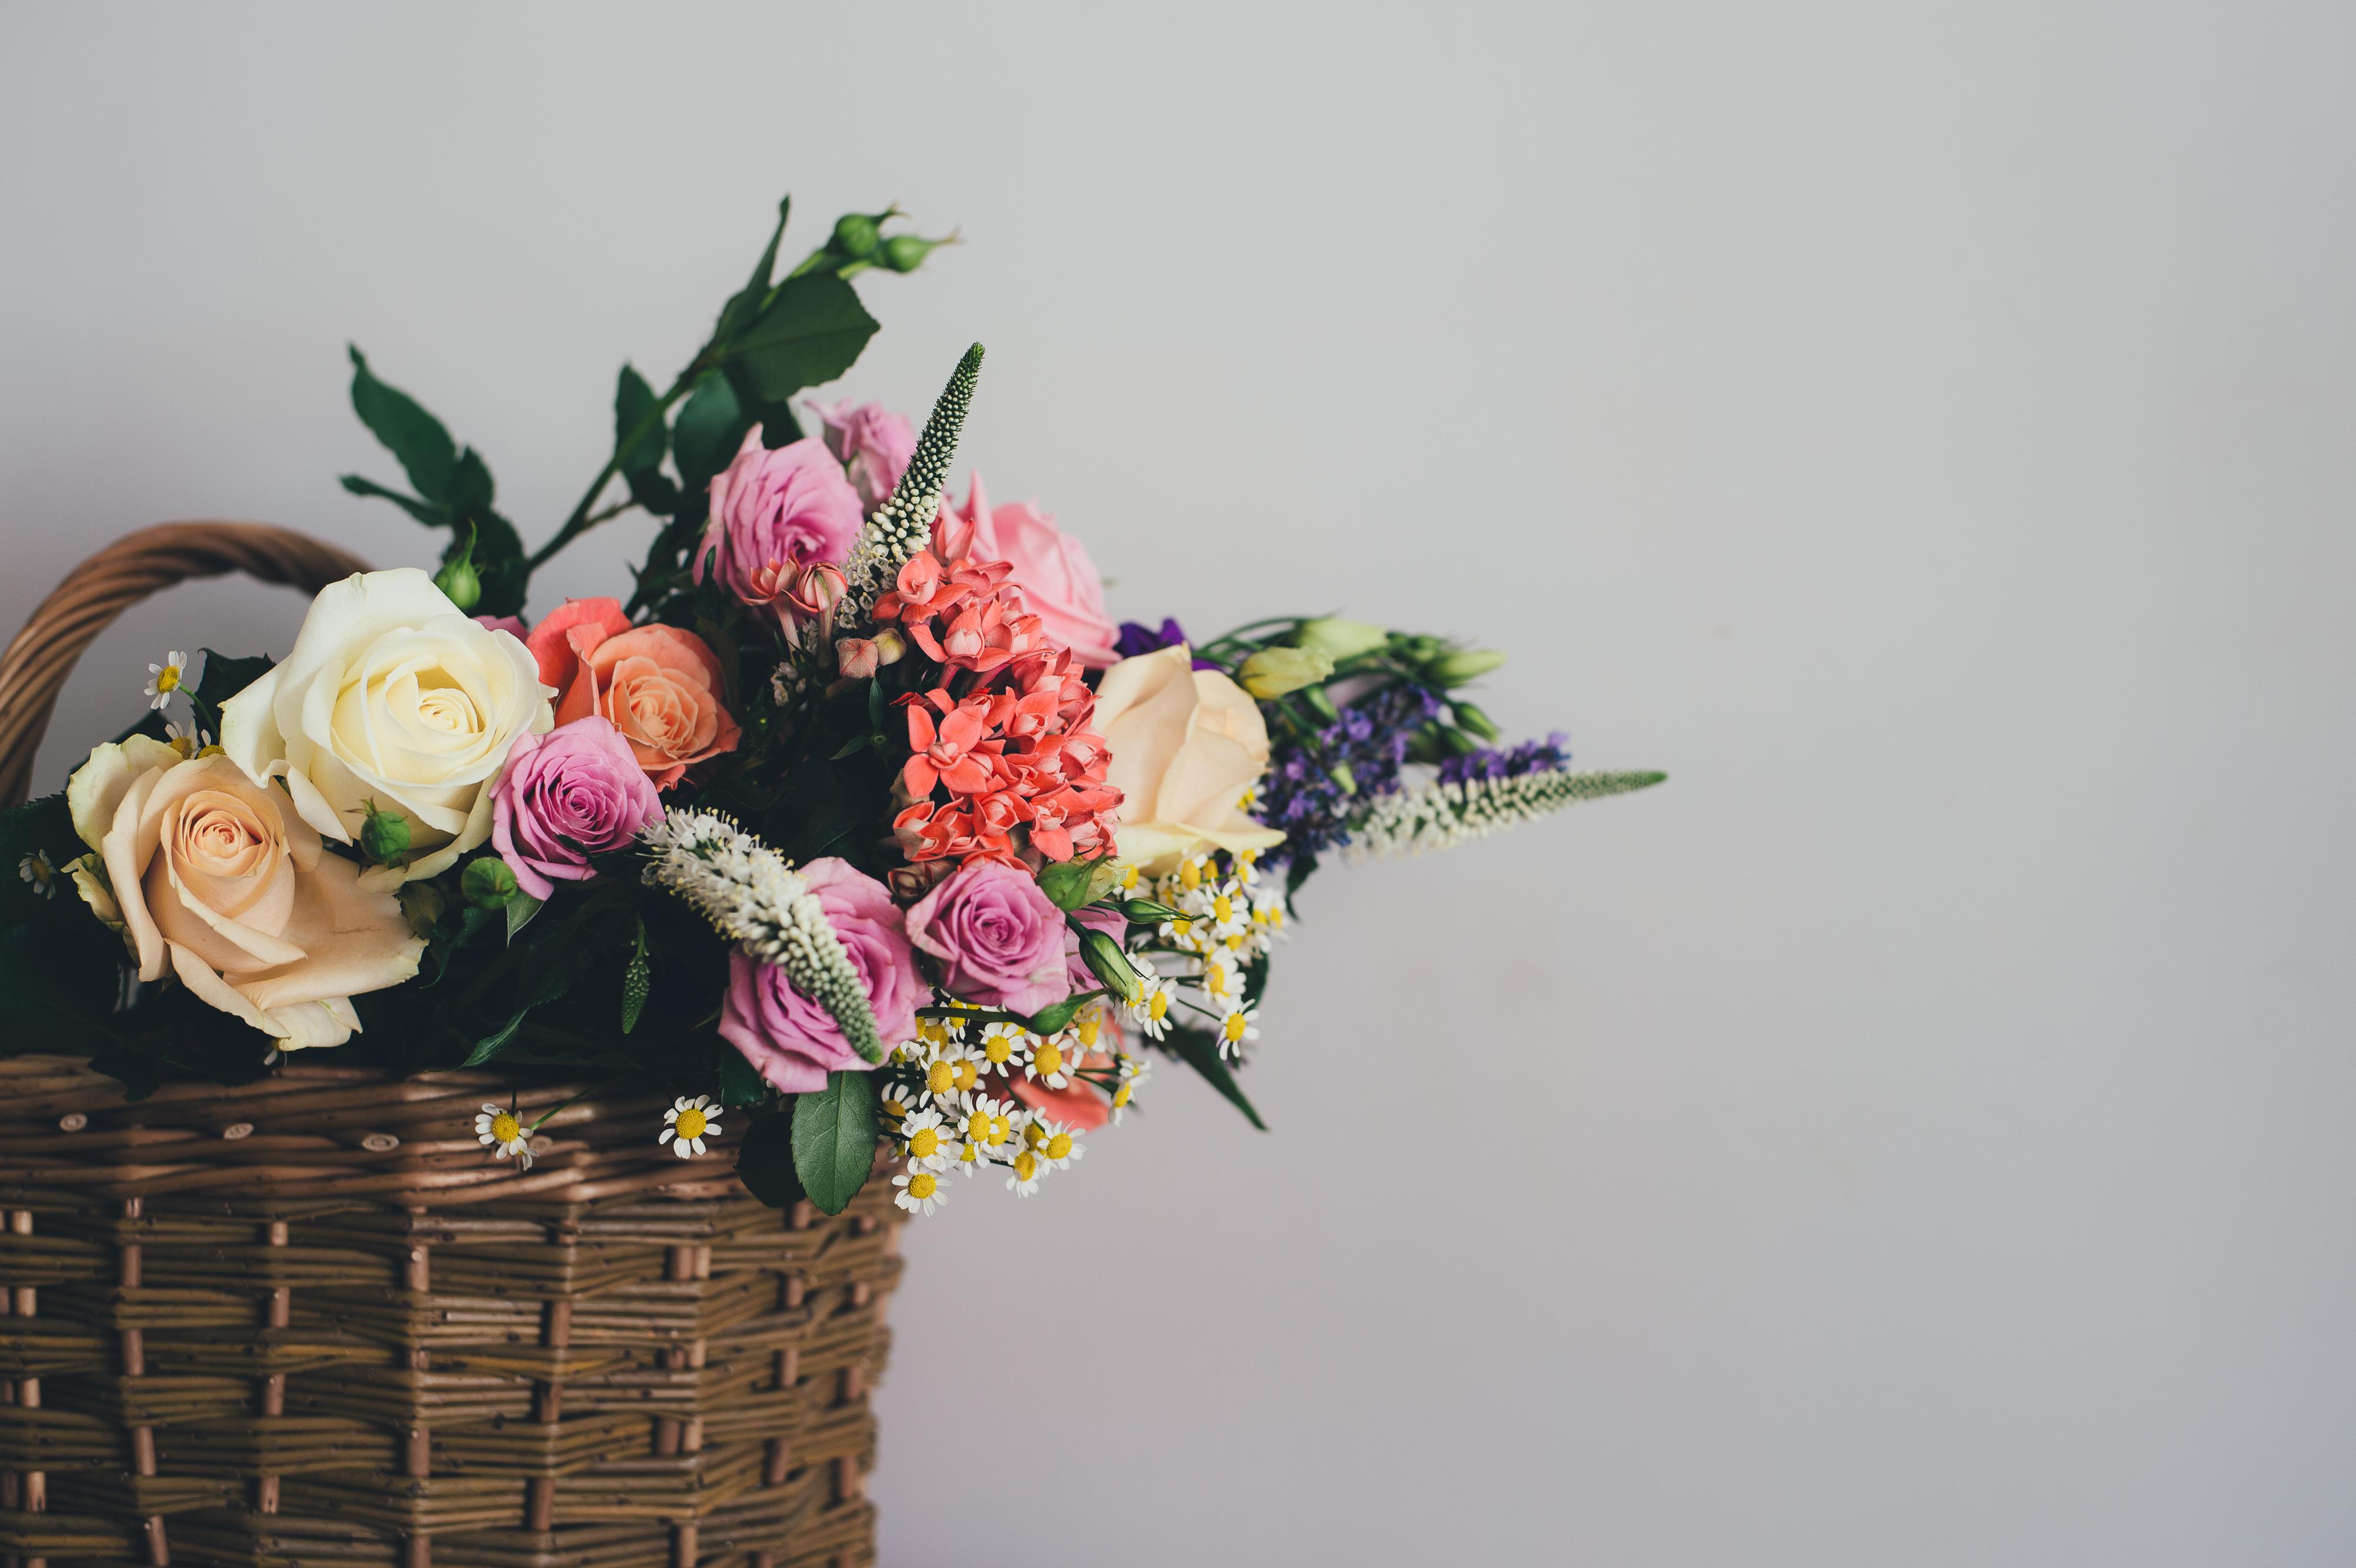 Free stock photos of flower arrangement · Pexels.